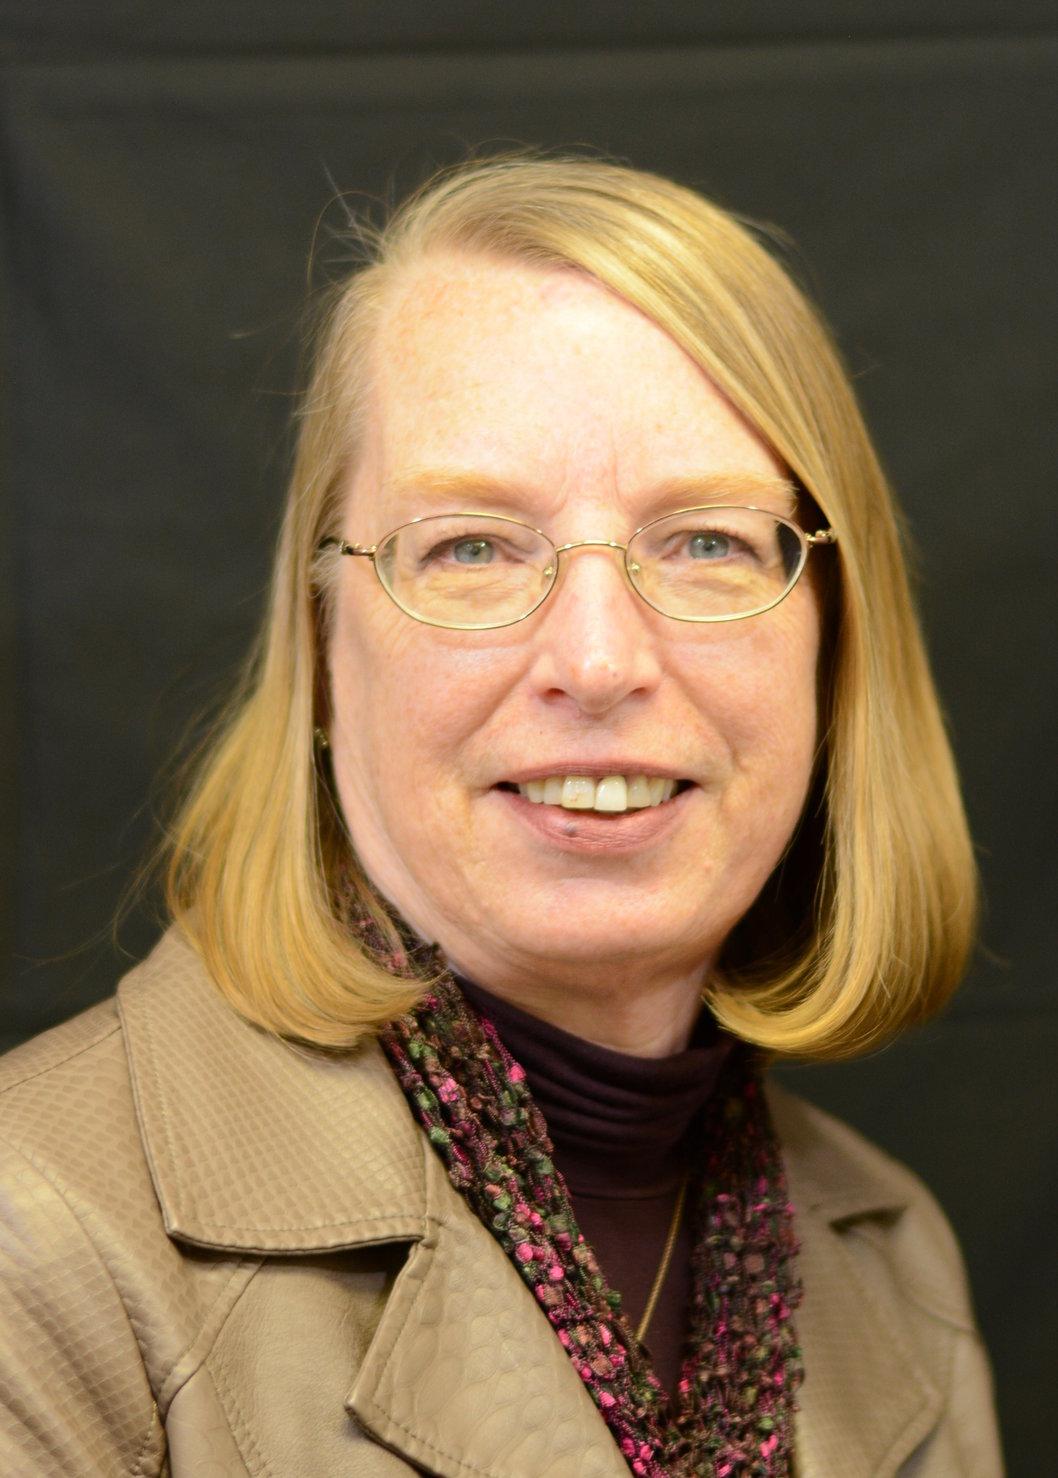 Marcia Lidtke